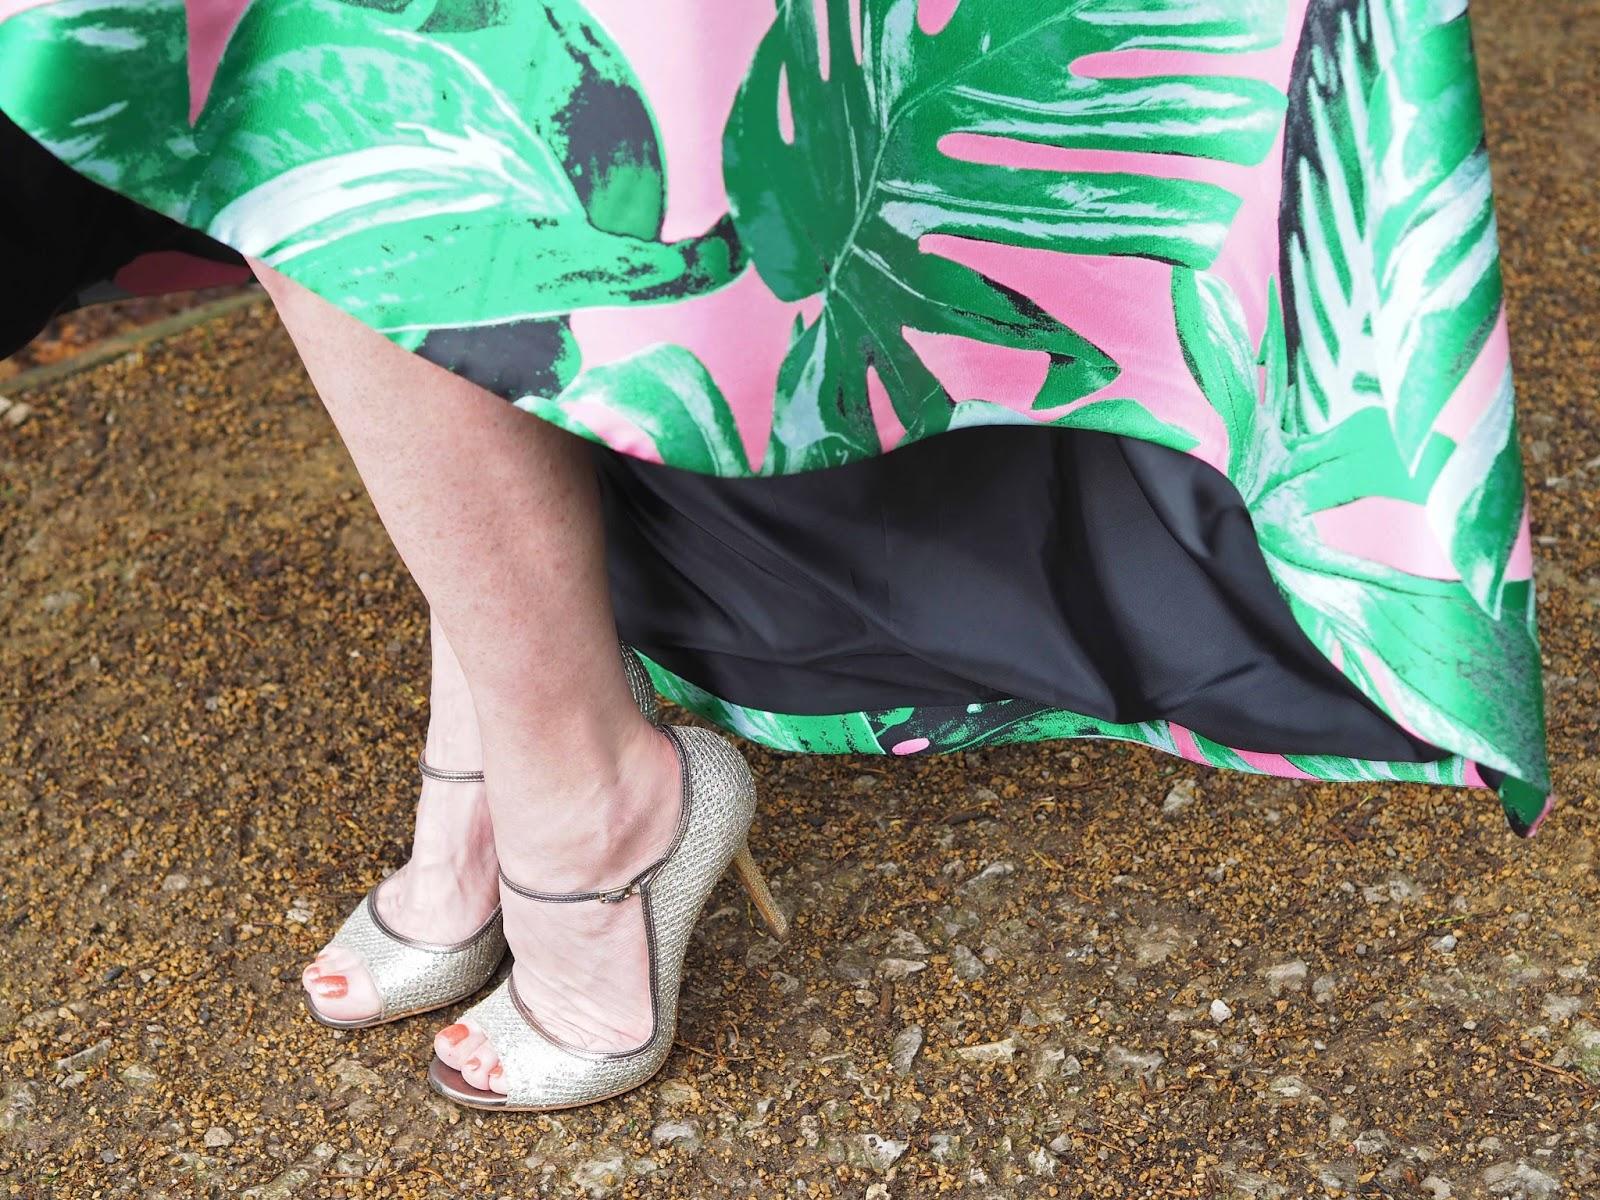 Asymmetric hem statement skirt, pink and black with large leaves, champagne glitter Jimmy Choo Tahiti sandals, occasionwear